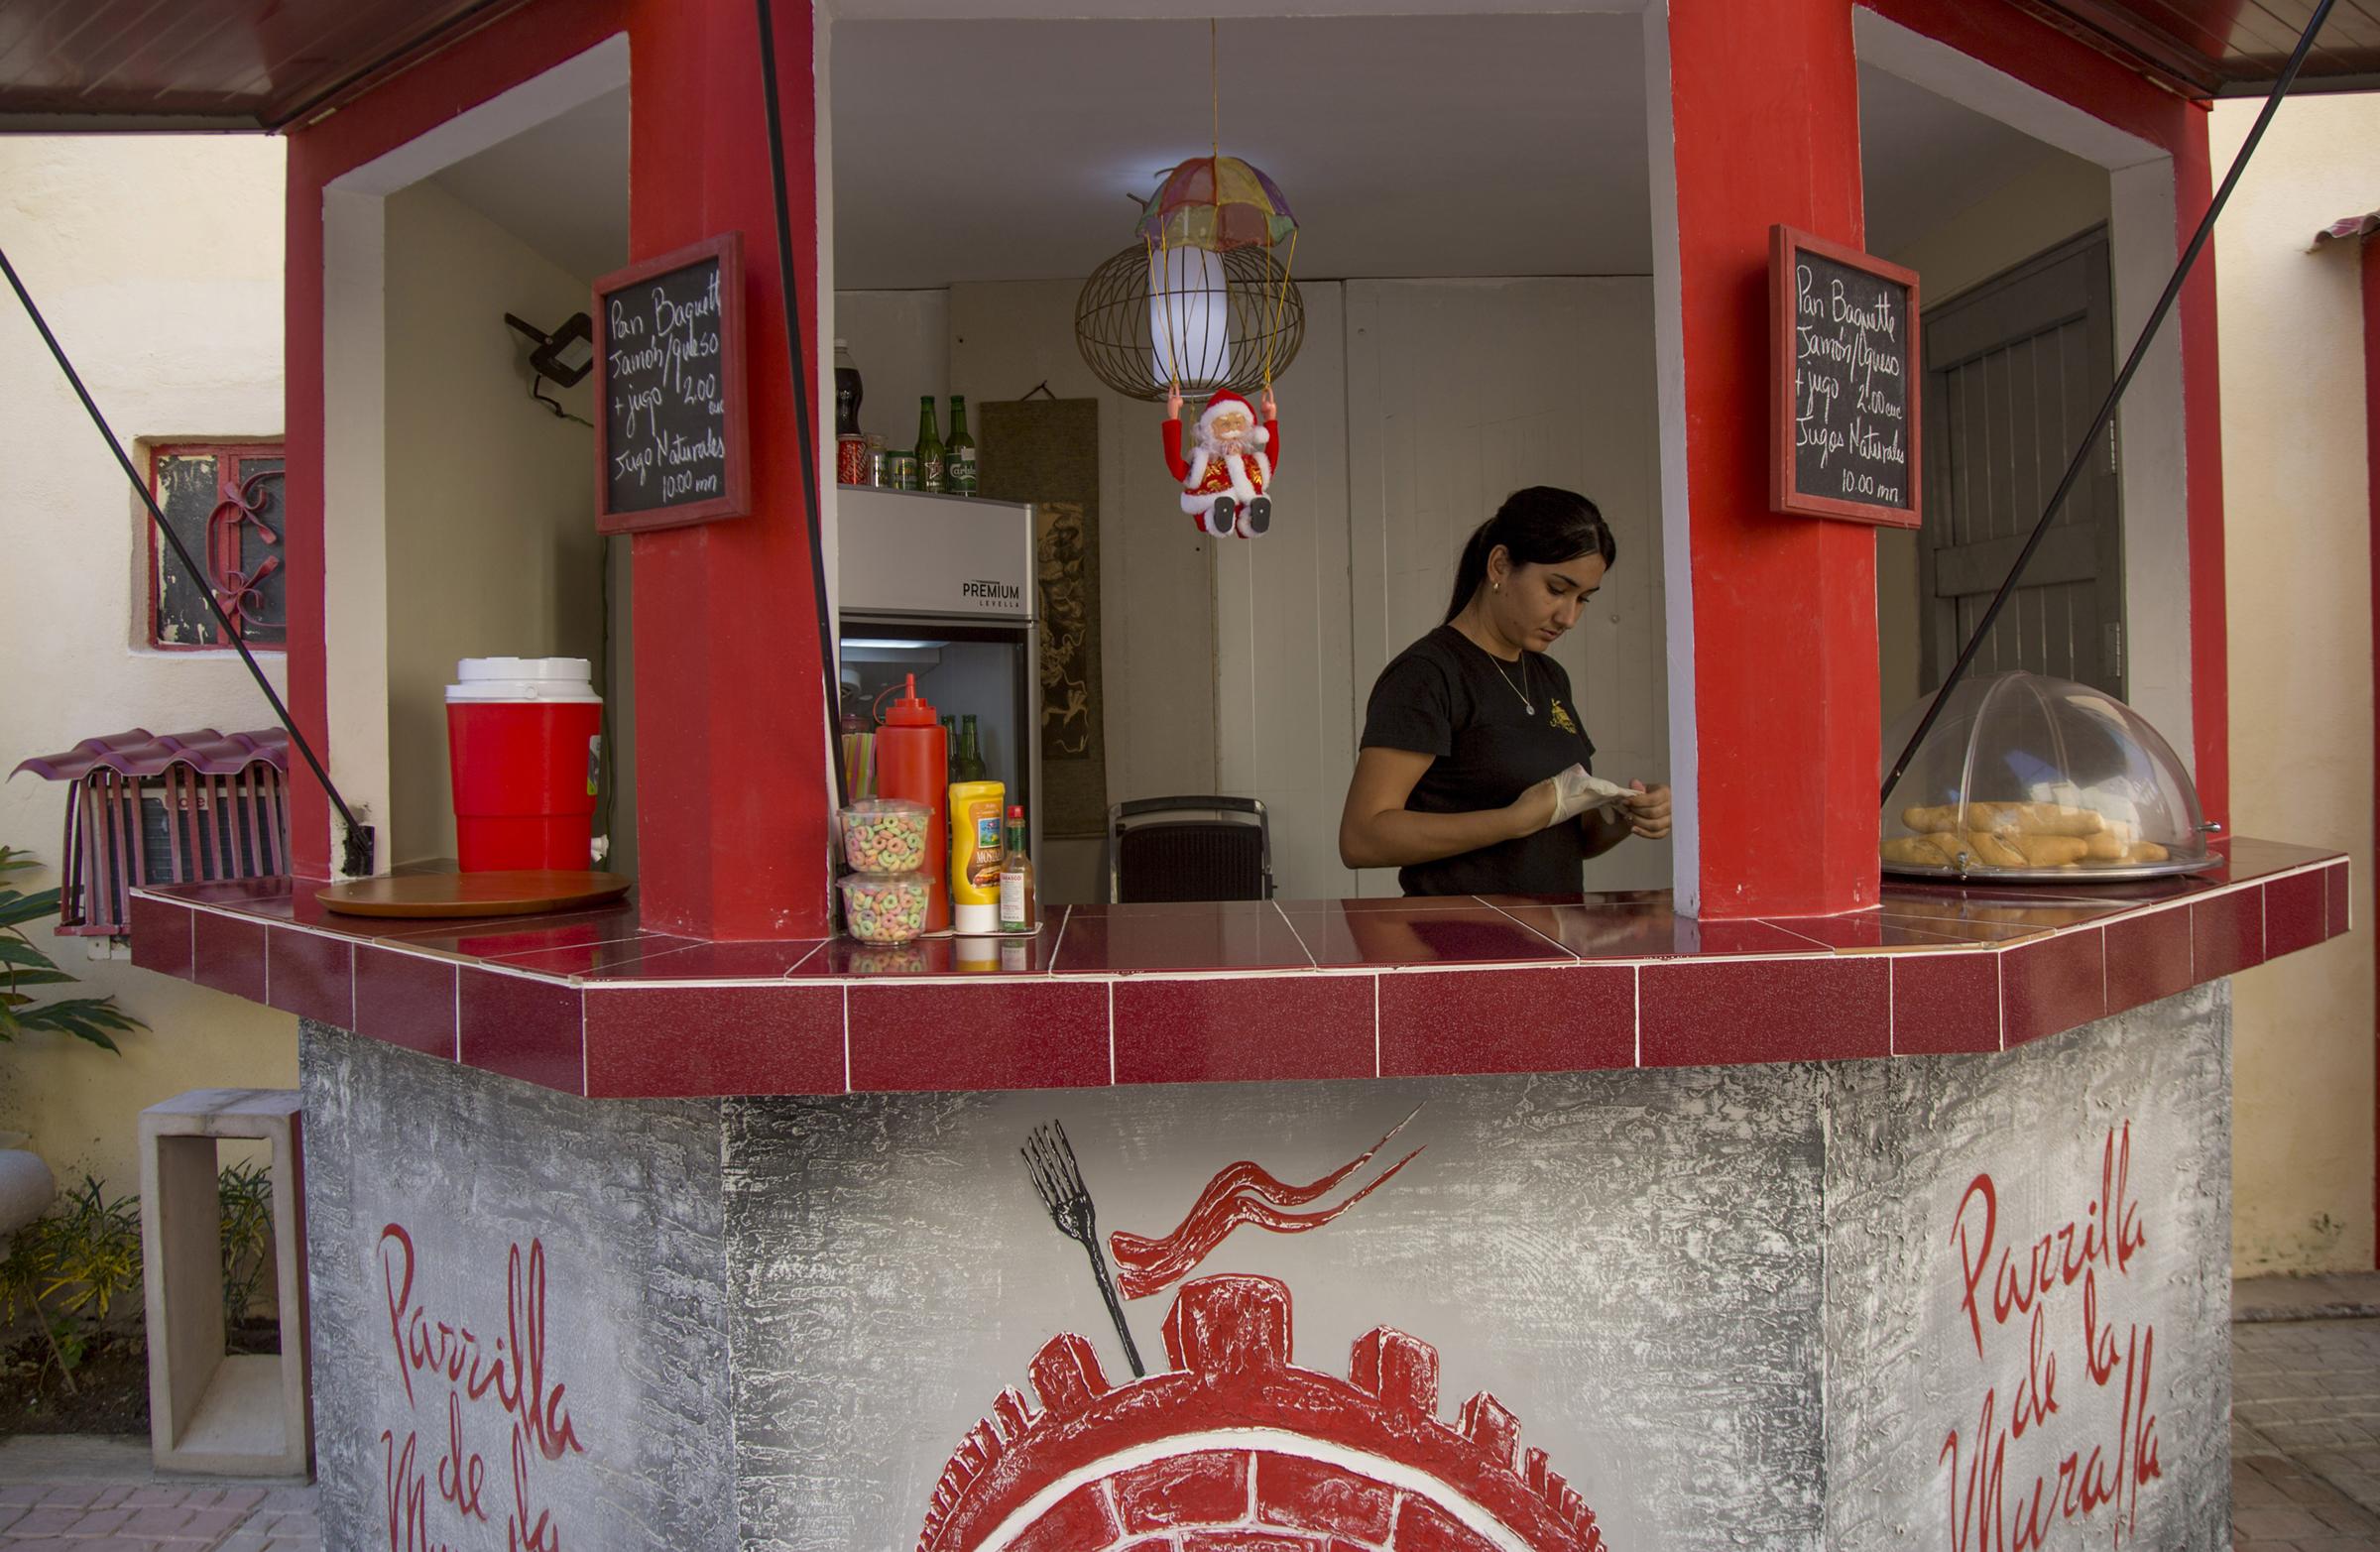 Alexa Garcia works at a cafe in Chinatown in Havana on Jan. 13, 2020.